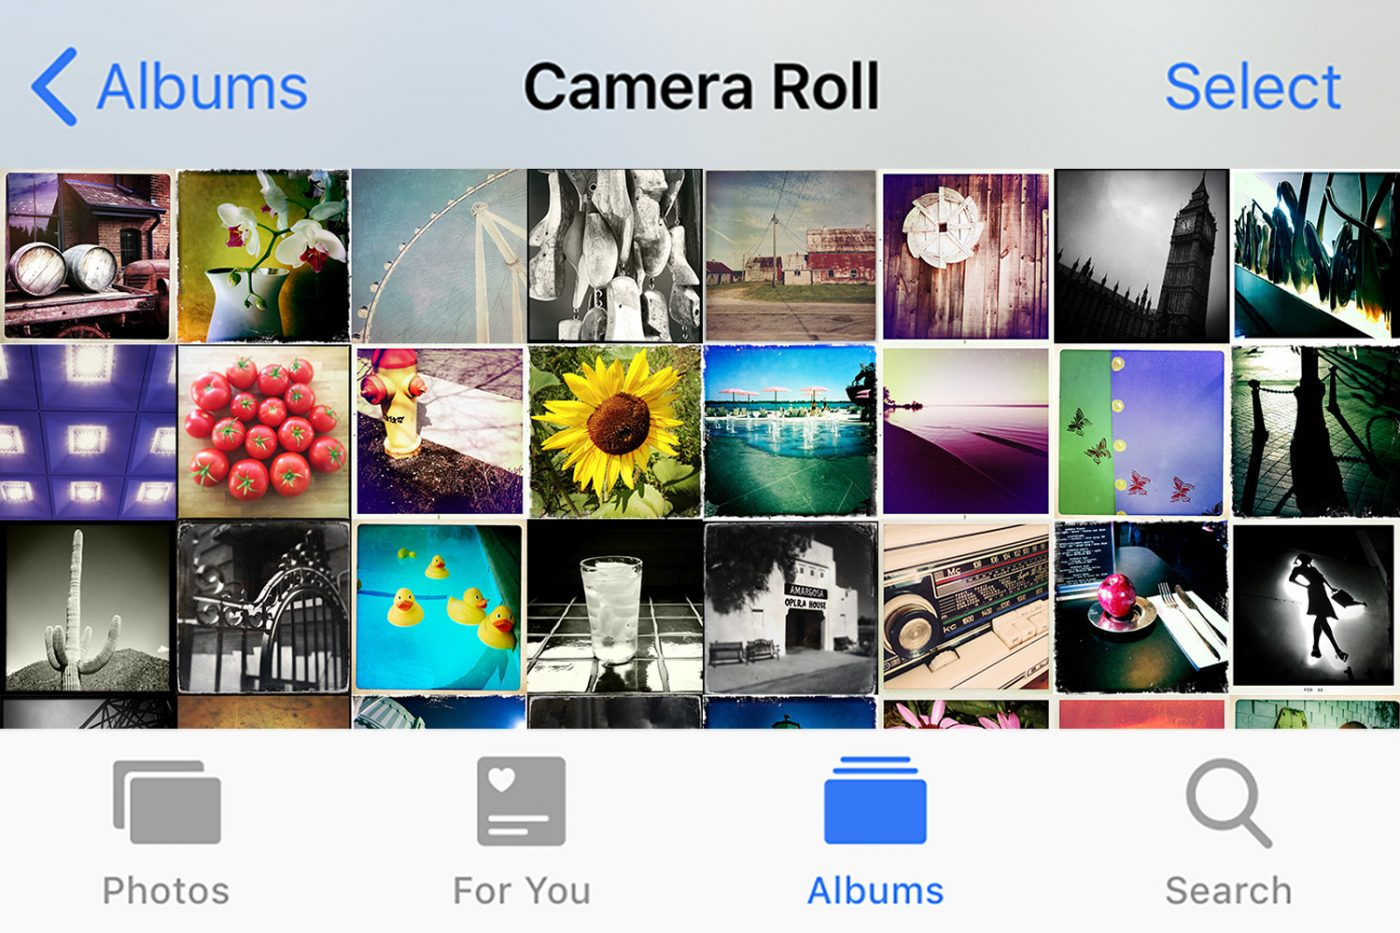 Screen shot of camera roll on smart phone